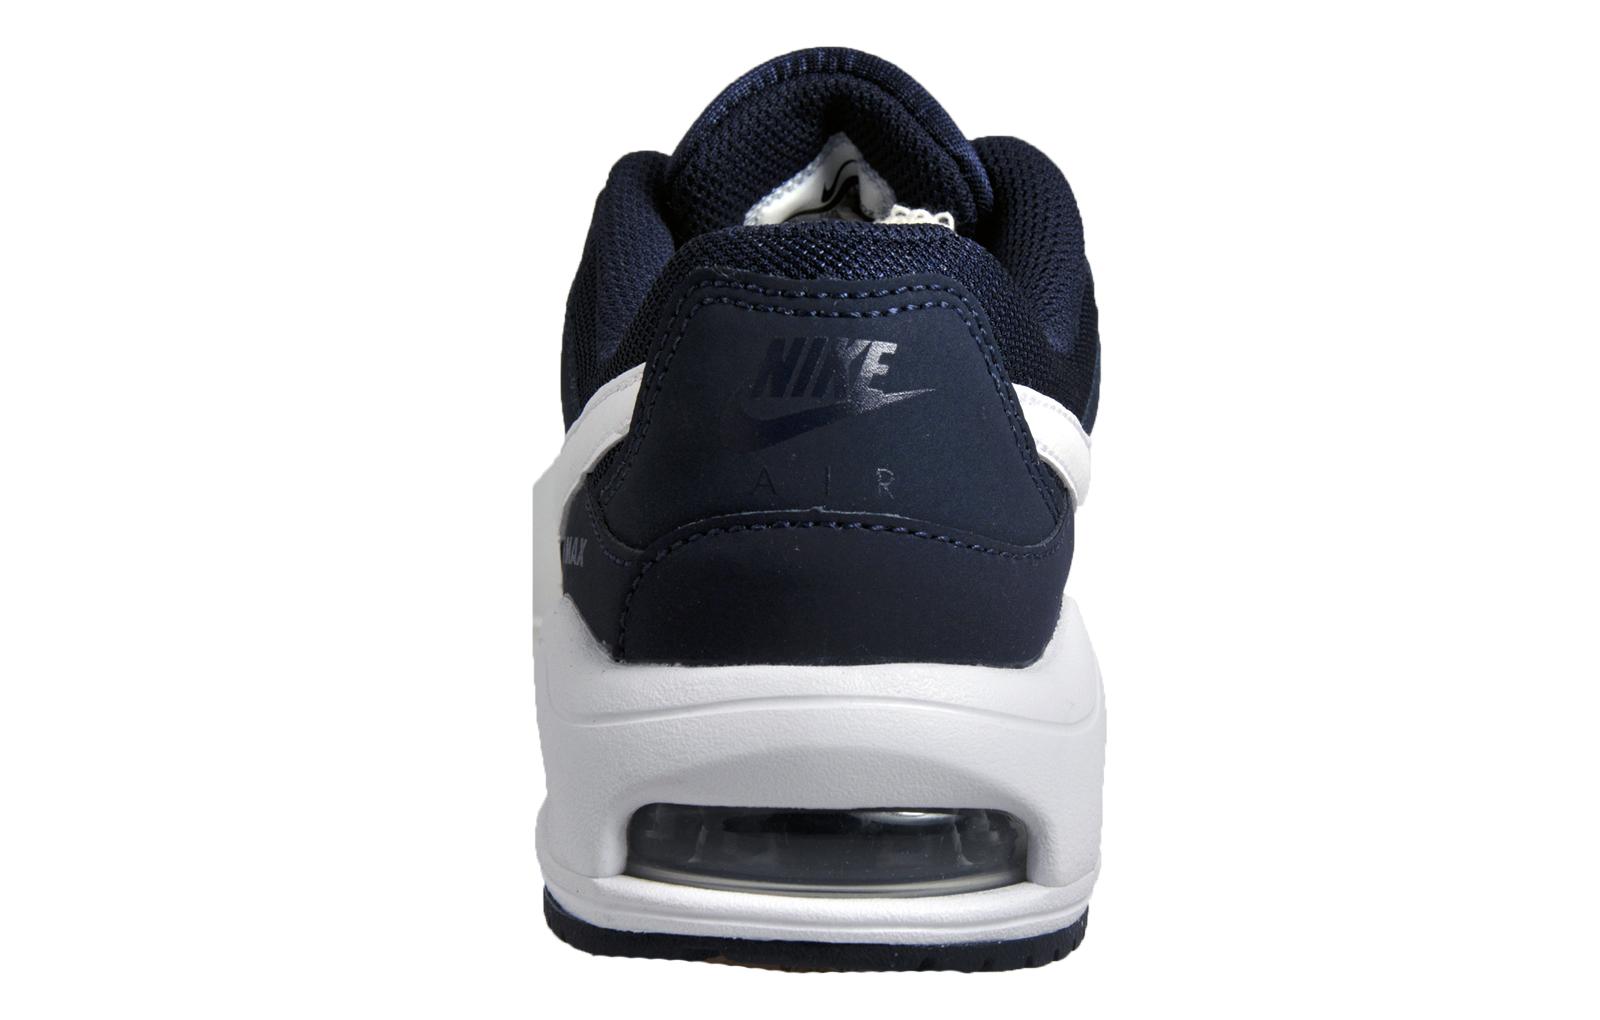 19d049fe74 Nike Air Max Command Flex Junior Kids Classic Casual Retro Trainers Navy